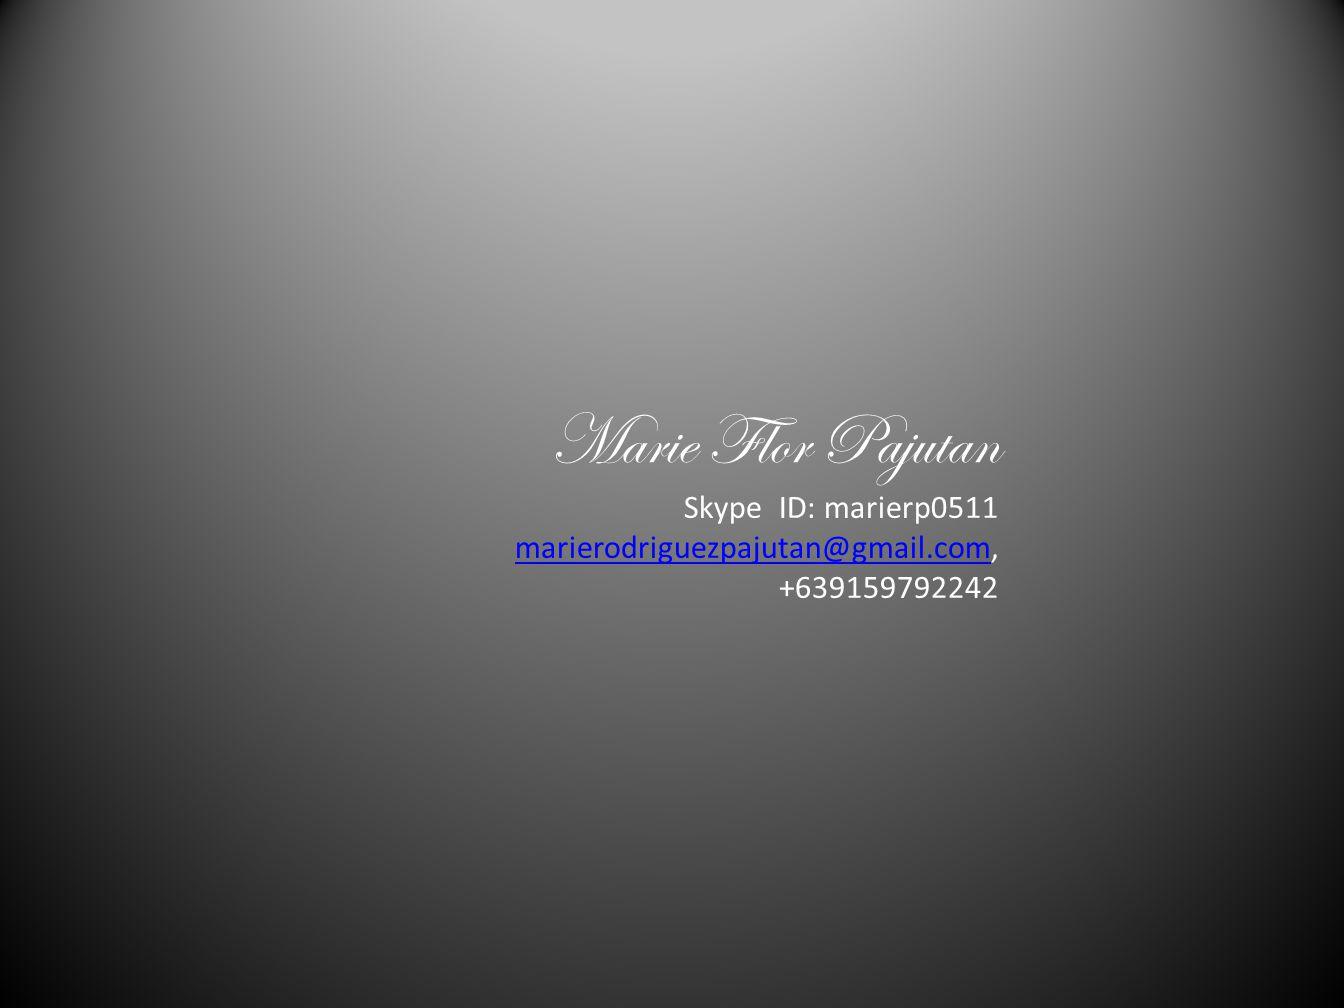 Marie Flor Pajutan Skype ID: marierp0511 marierodriguezpajutan@gmail.commarierodriguezpajutan@gmail.com, +639159792242